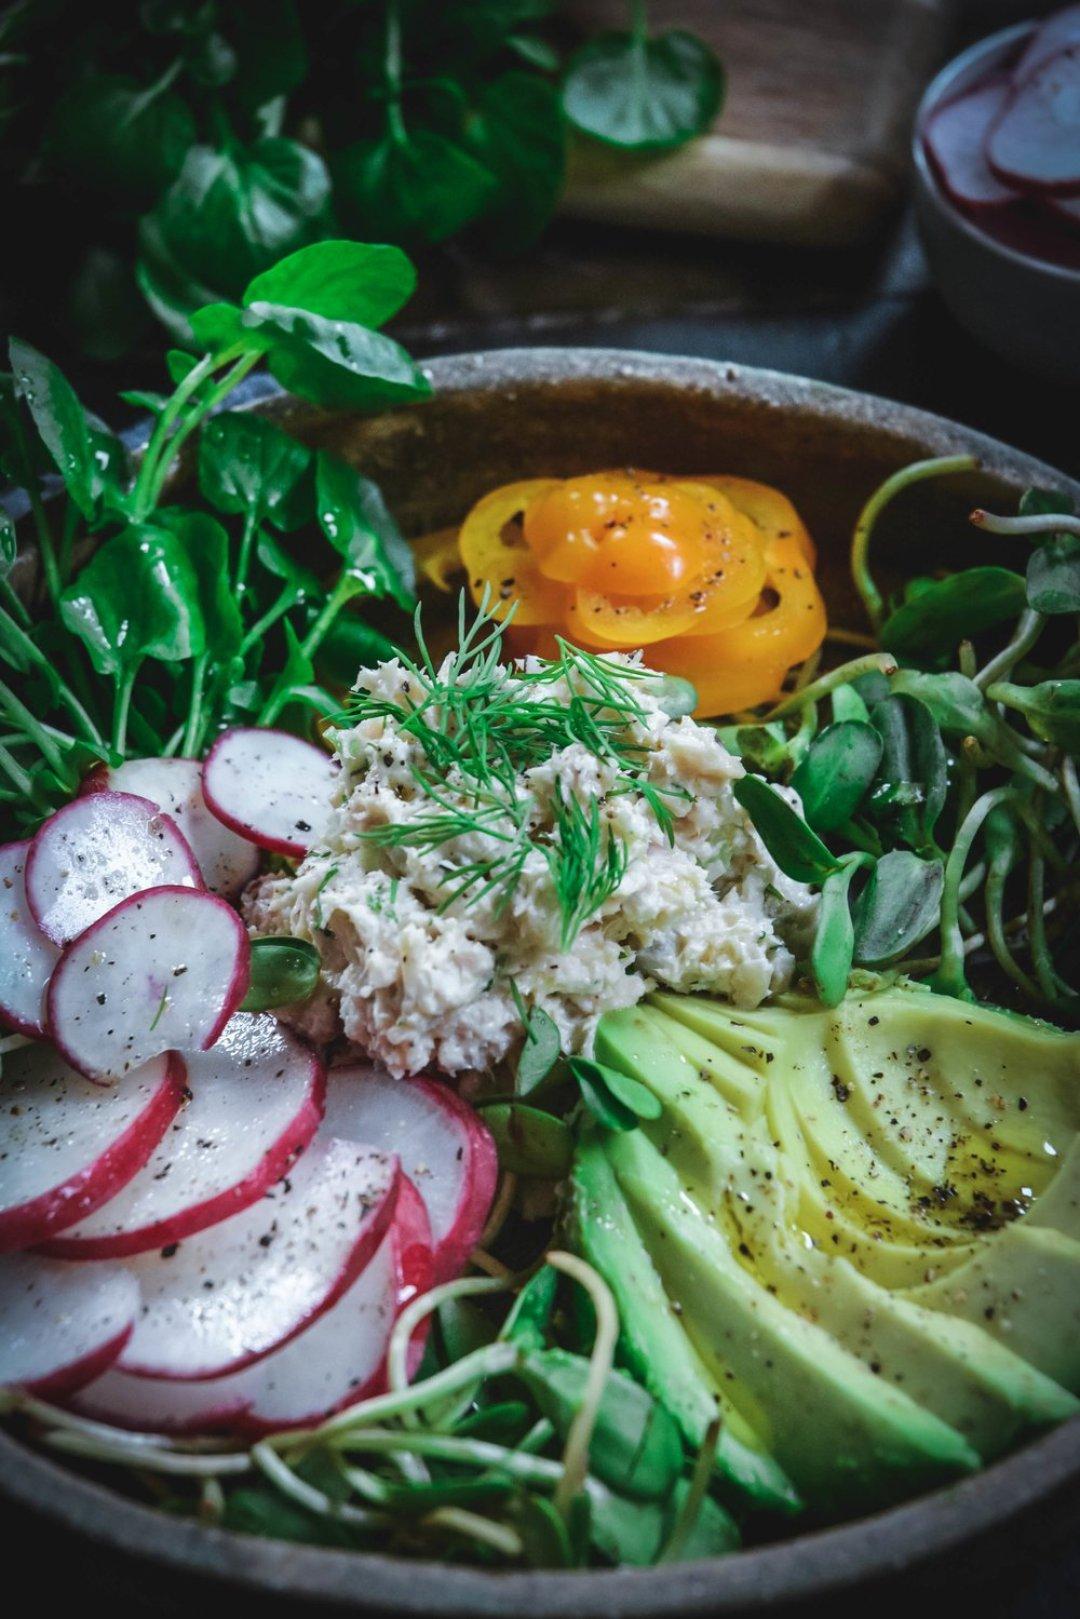 Tuna salad on plate with avocado, orange pepper, greens and sliced radishes